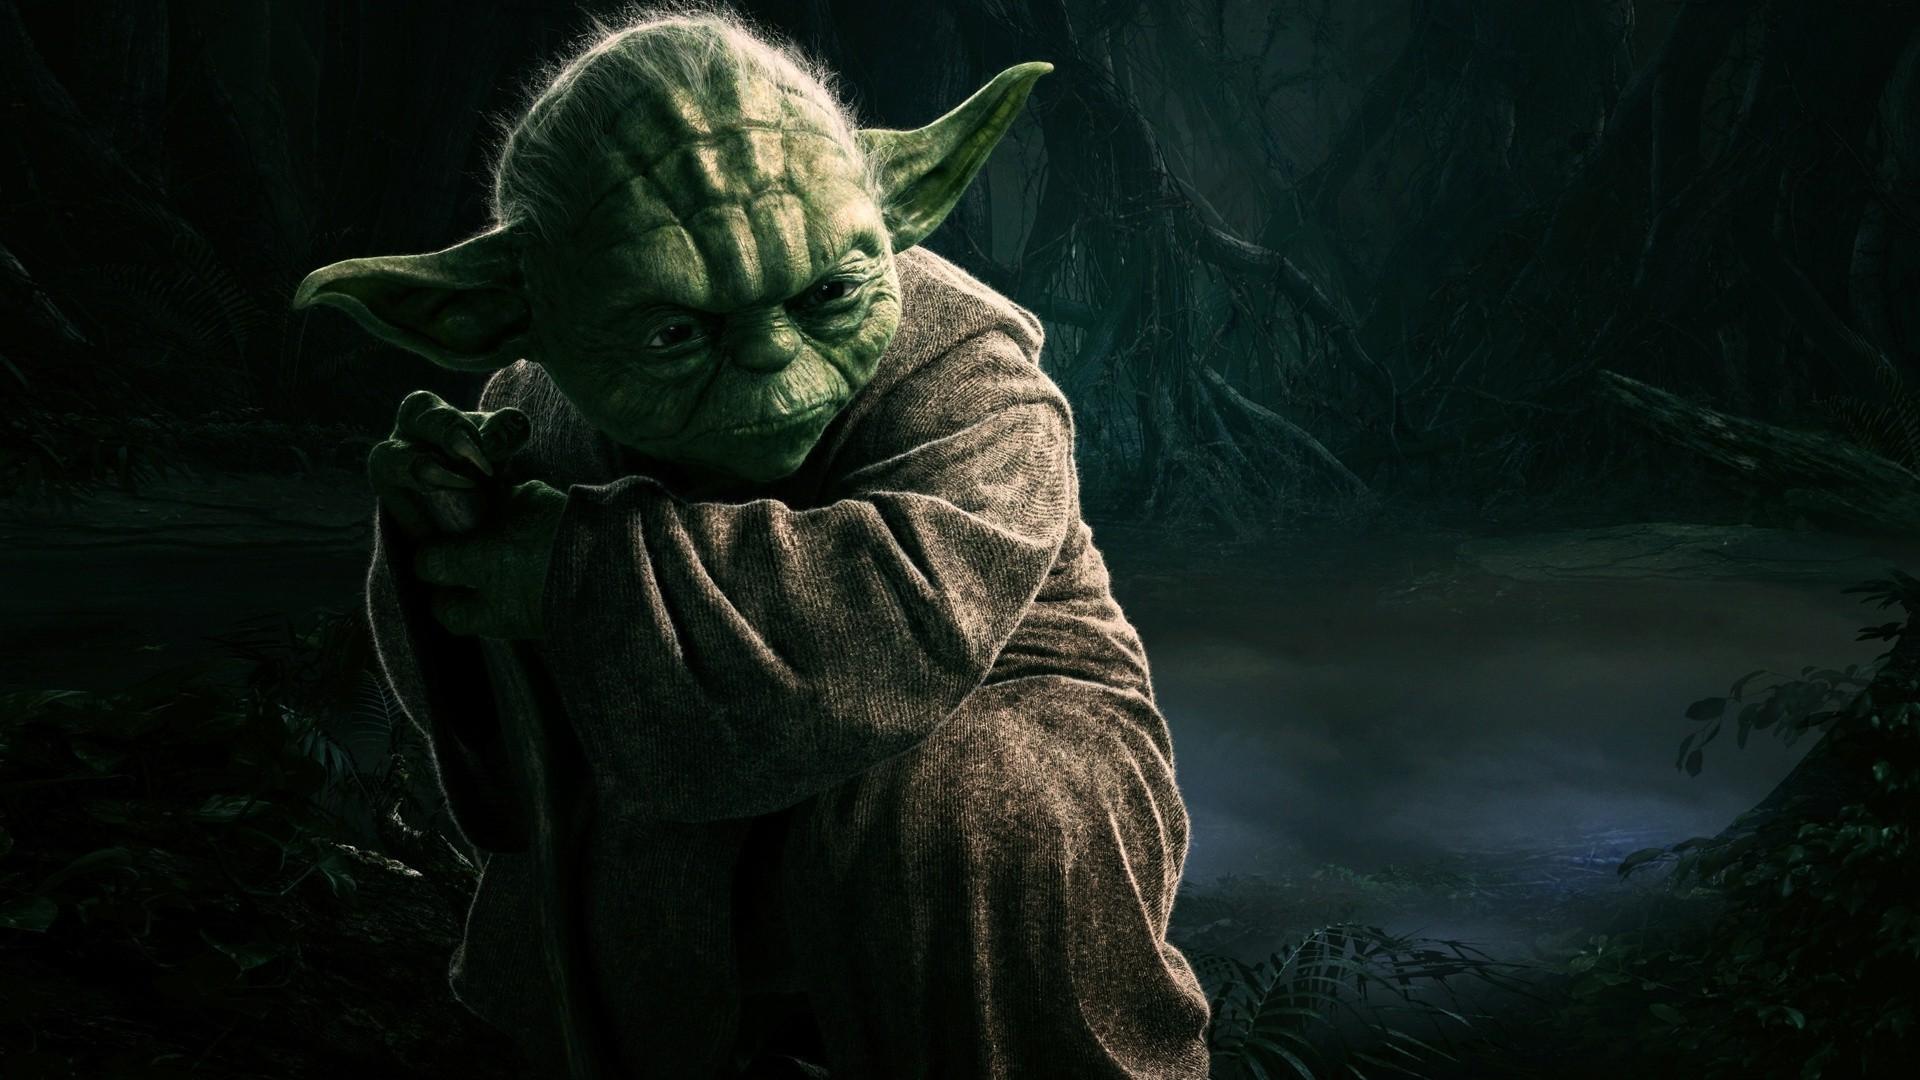 Star Wars Jedi Wallpapers High Quality